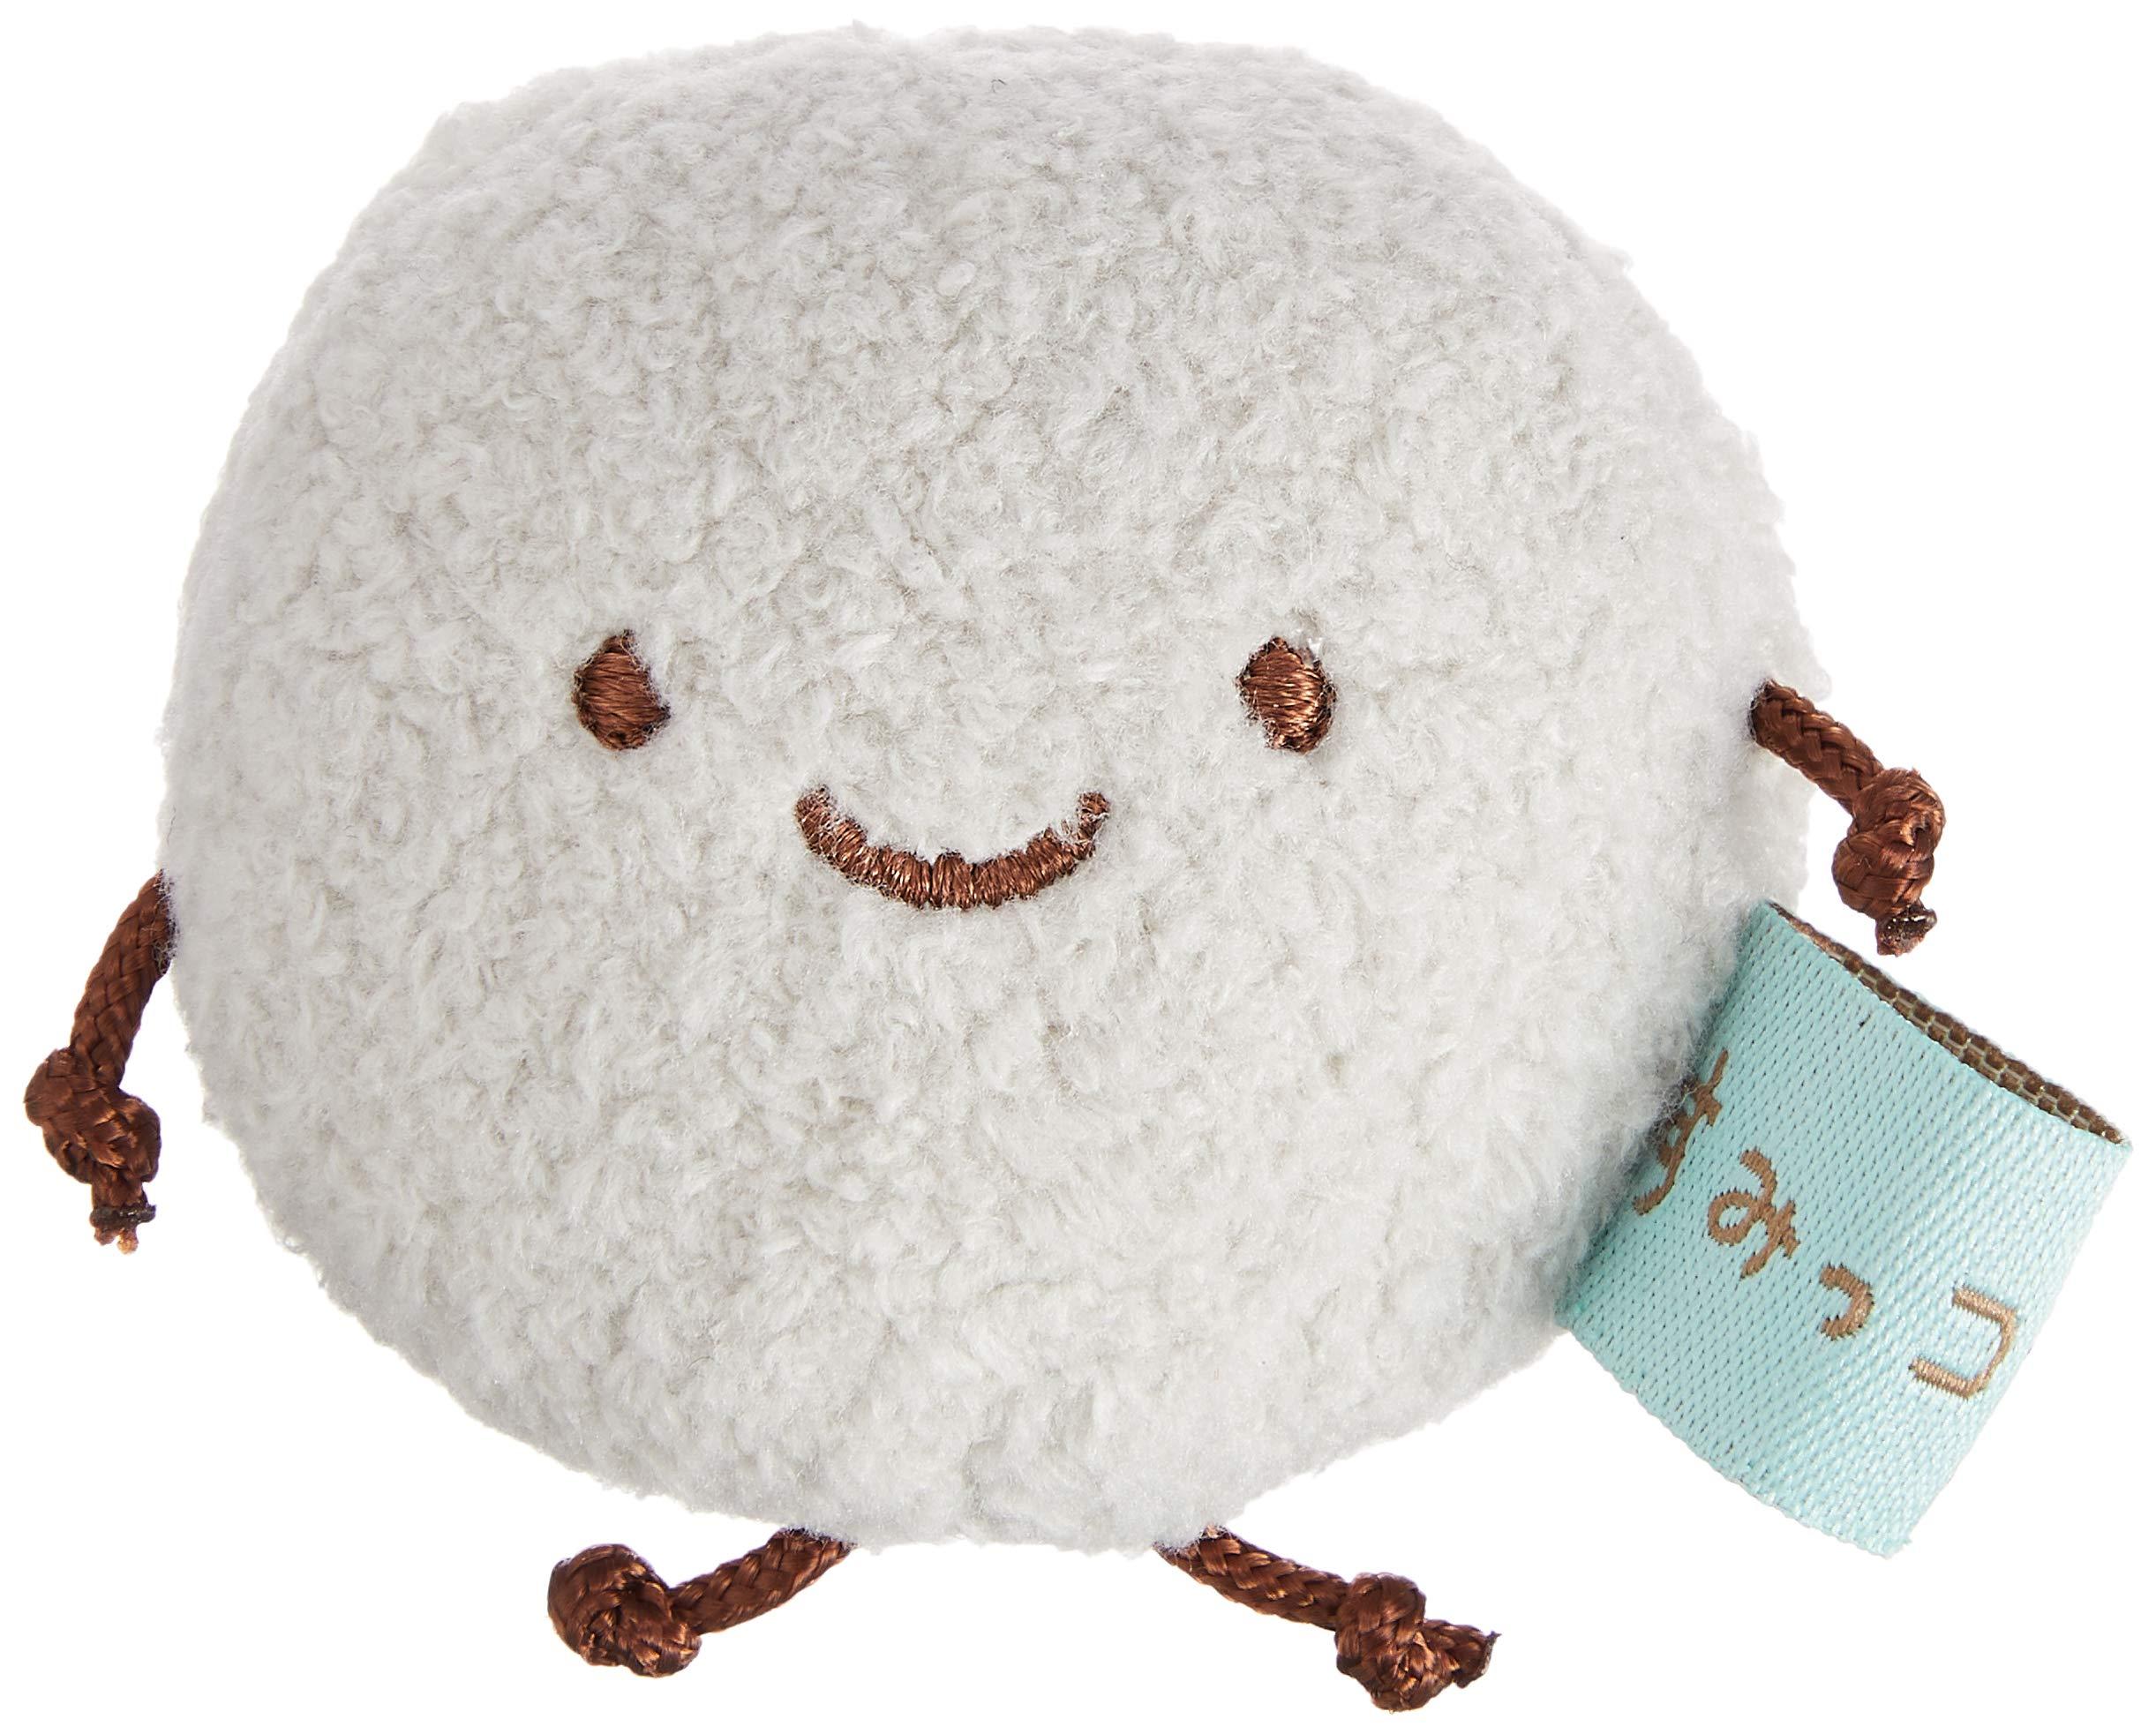 San-x Sumikko Gurashi Plush 2'' Dust w/ Mini Dust